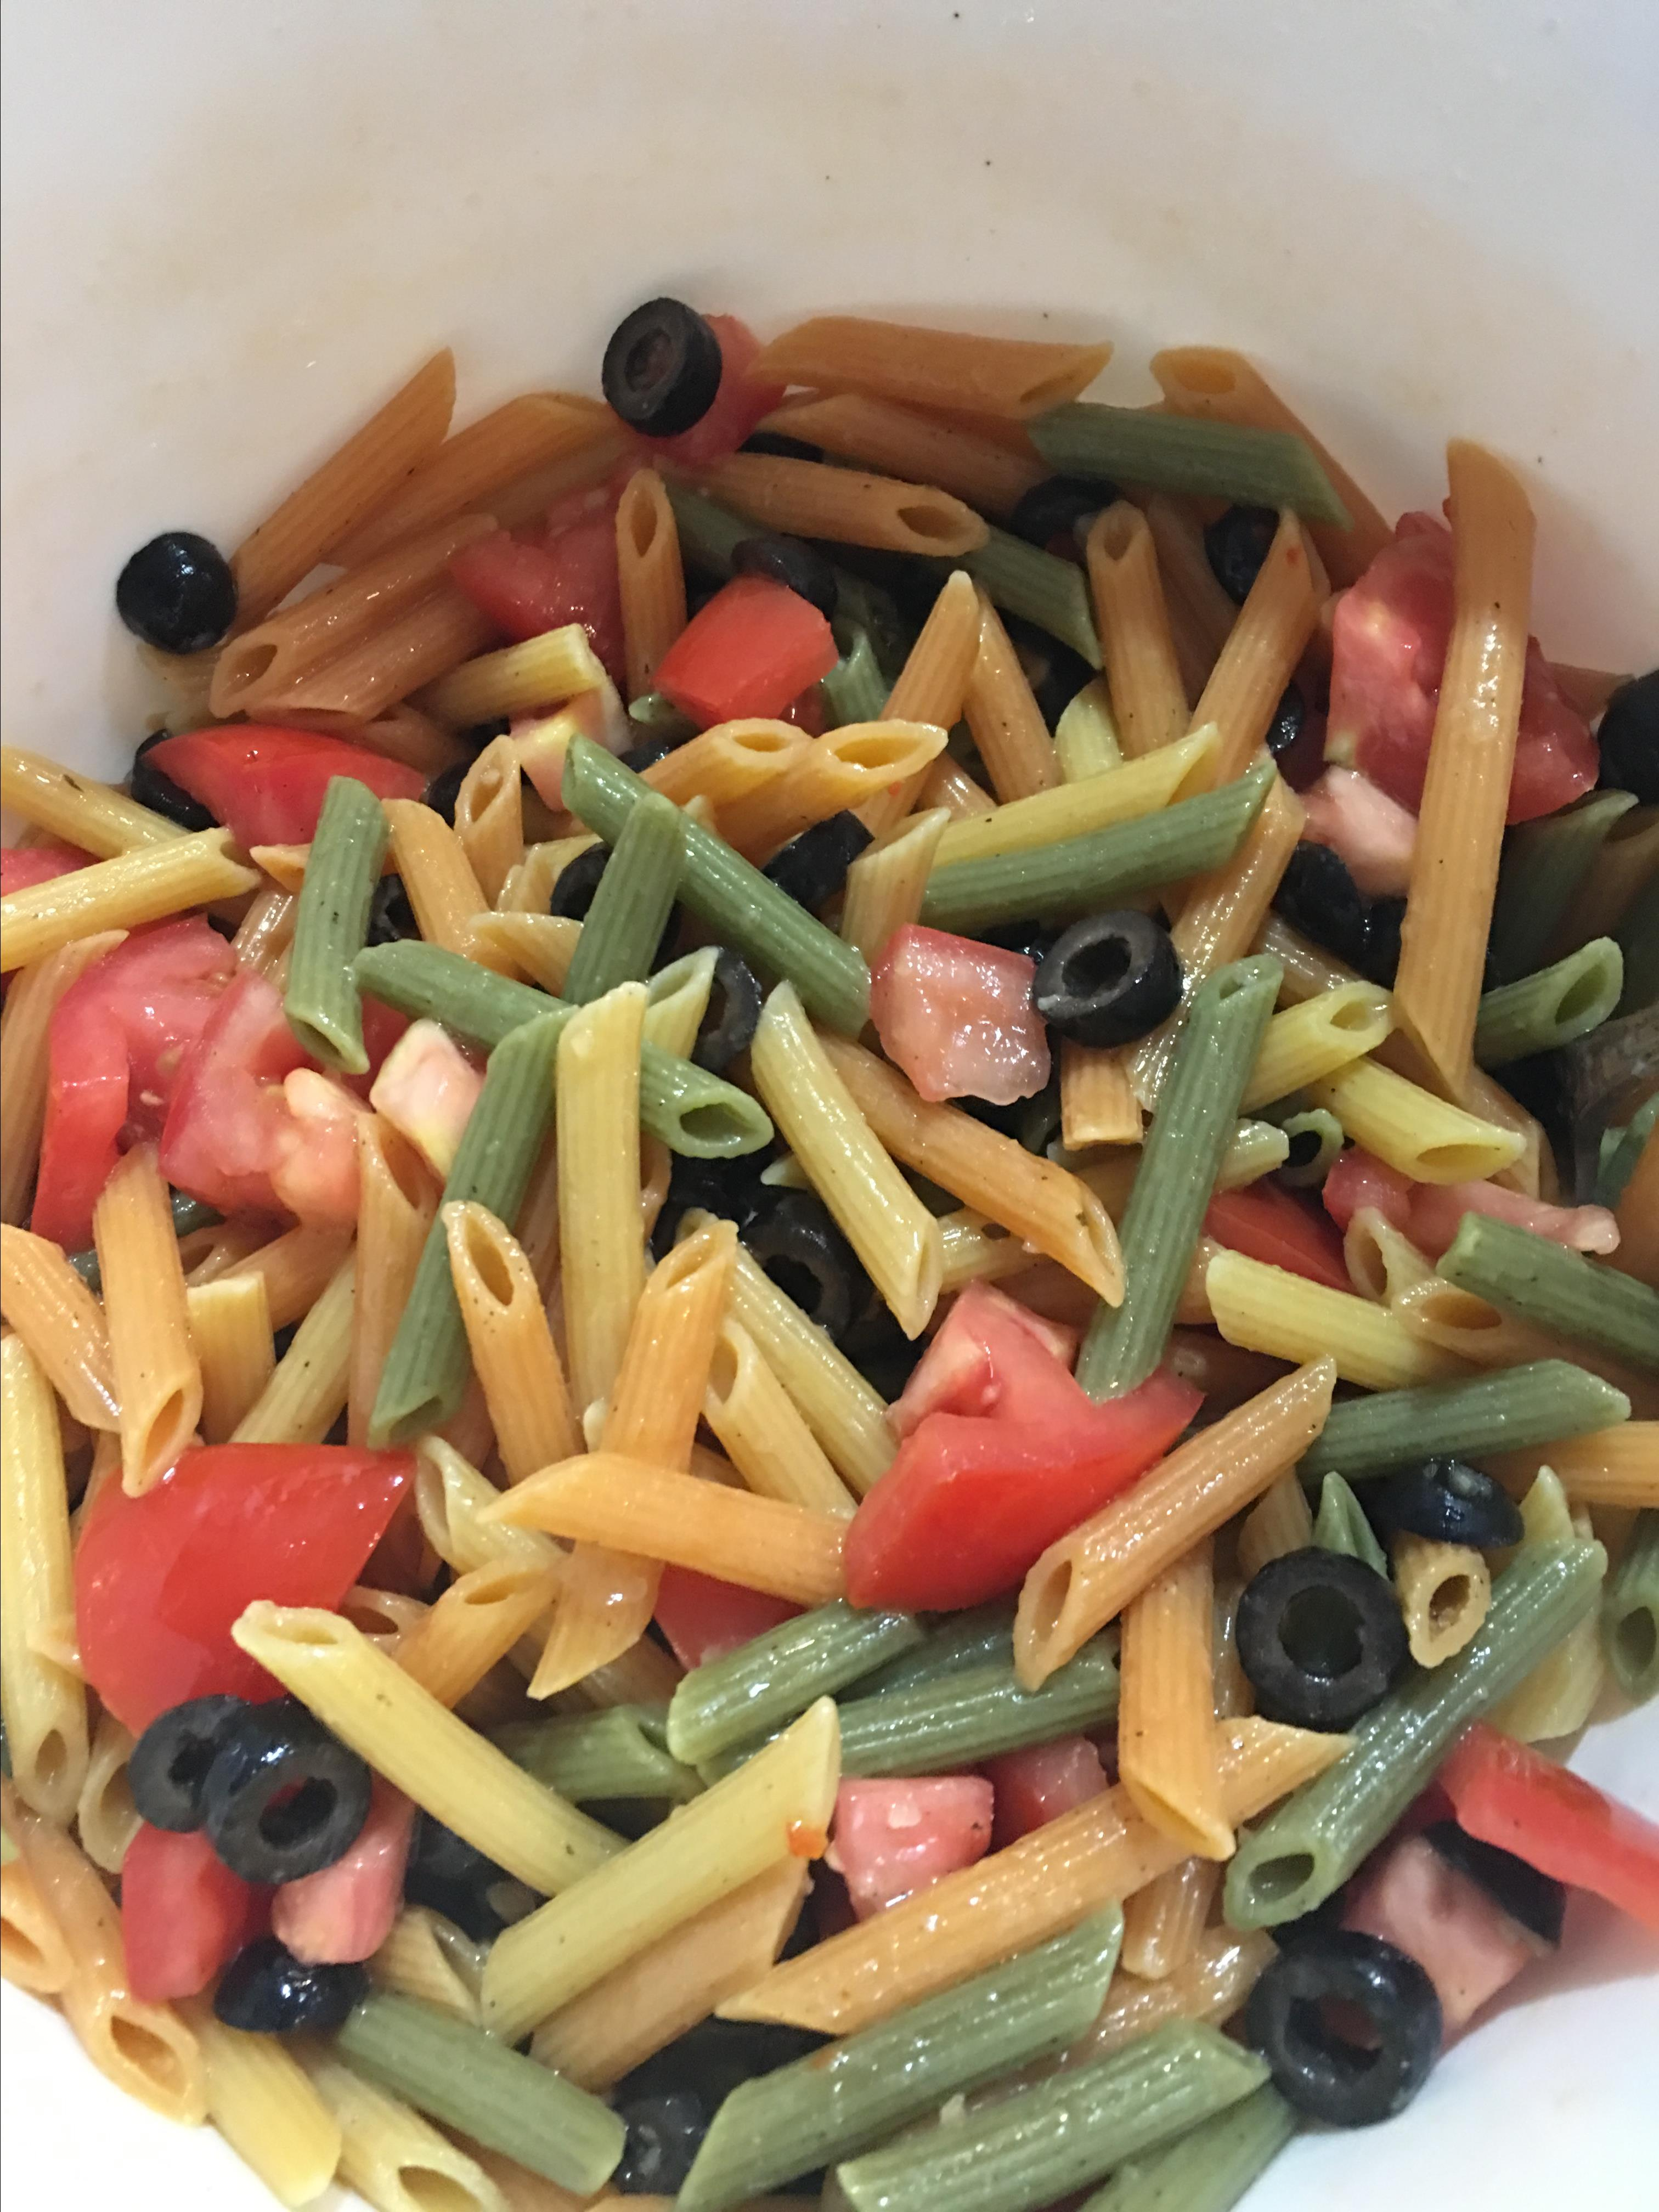 Easy Olive Oil, Tomato, and Basil Pasta Tom Harman